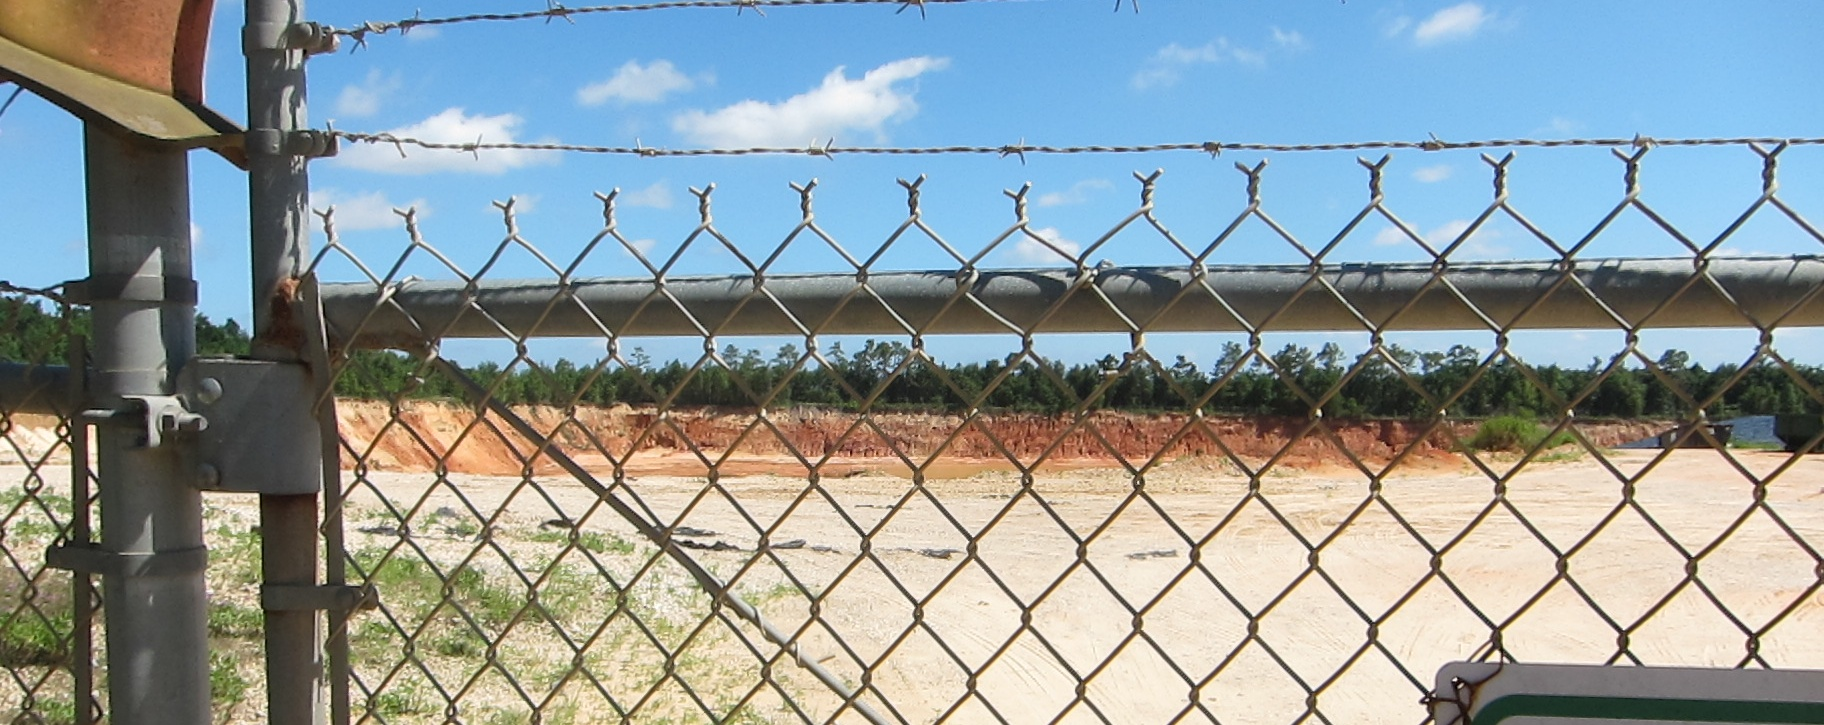 The closed Longleaf C&D Disposal facility on Longleaf Drive.